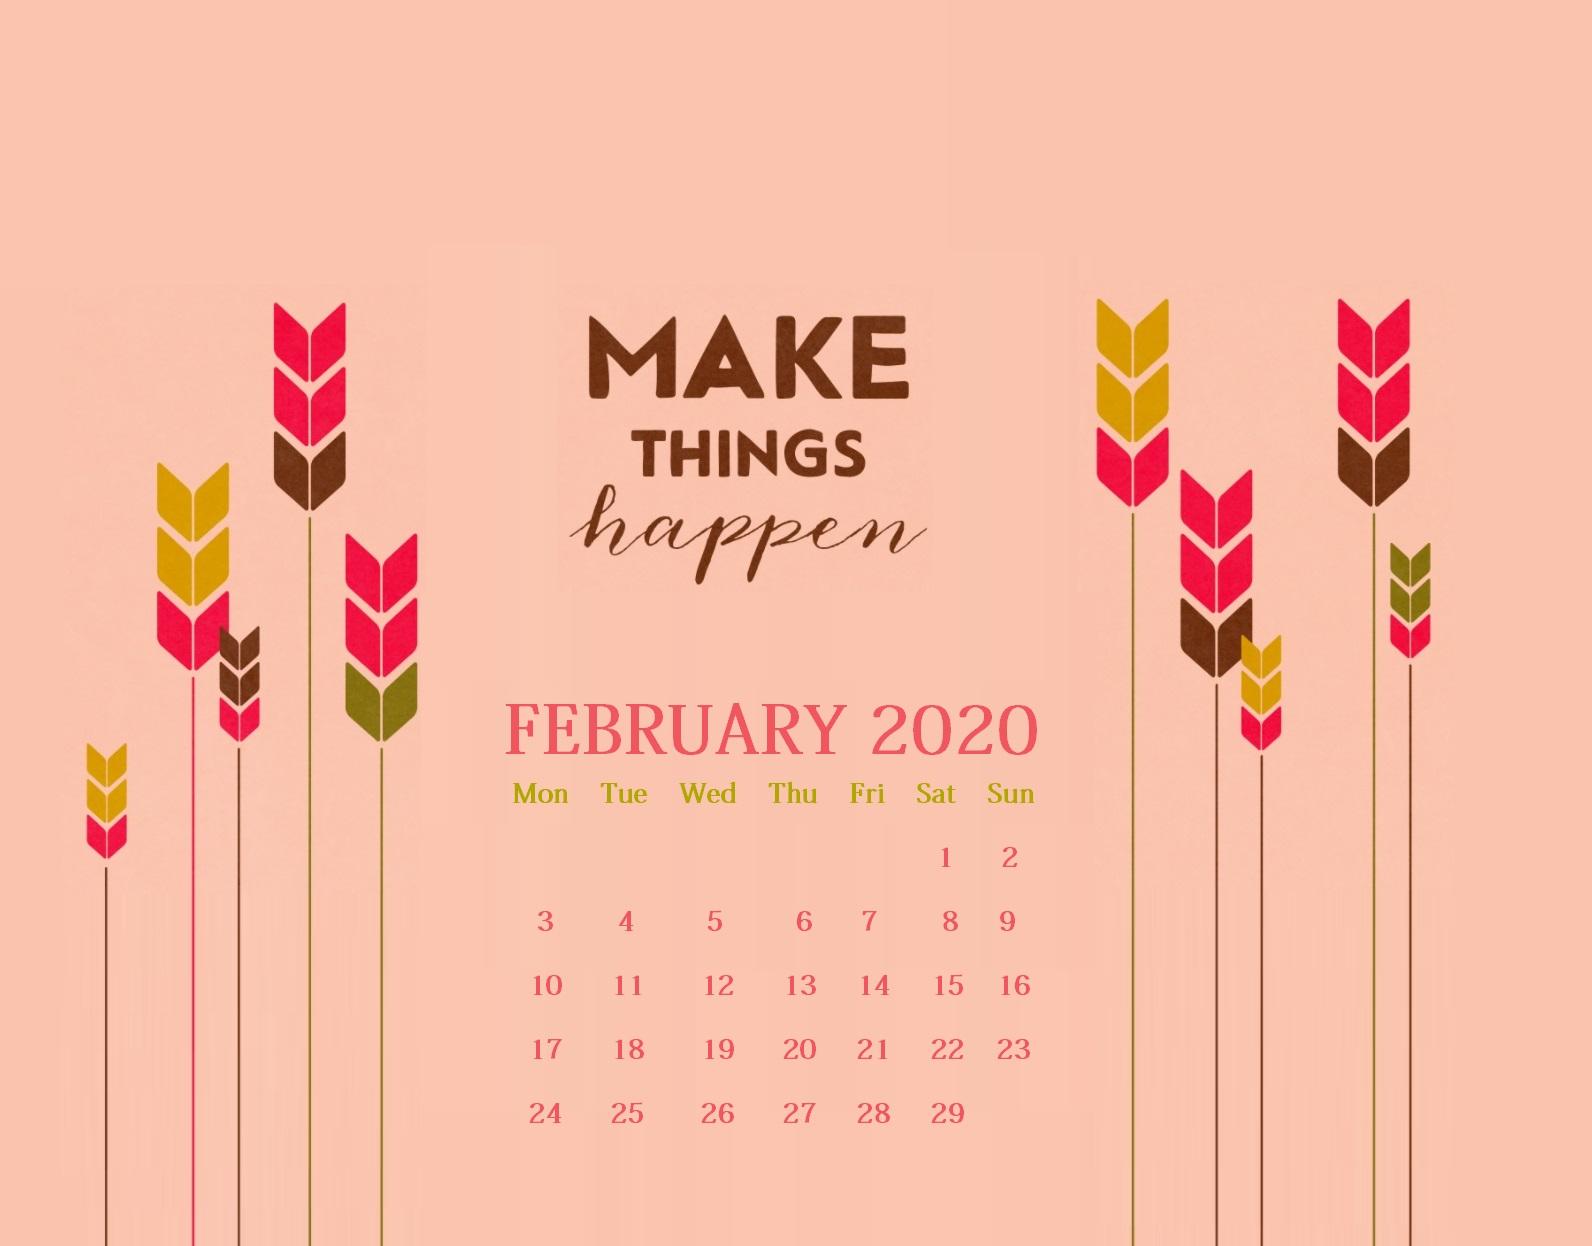 Floral February 2020 Desktop Calendar